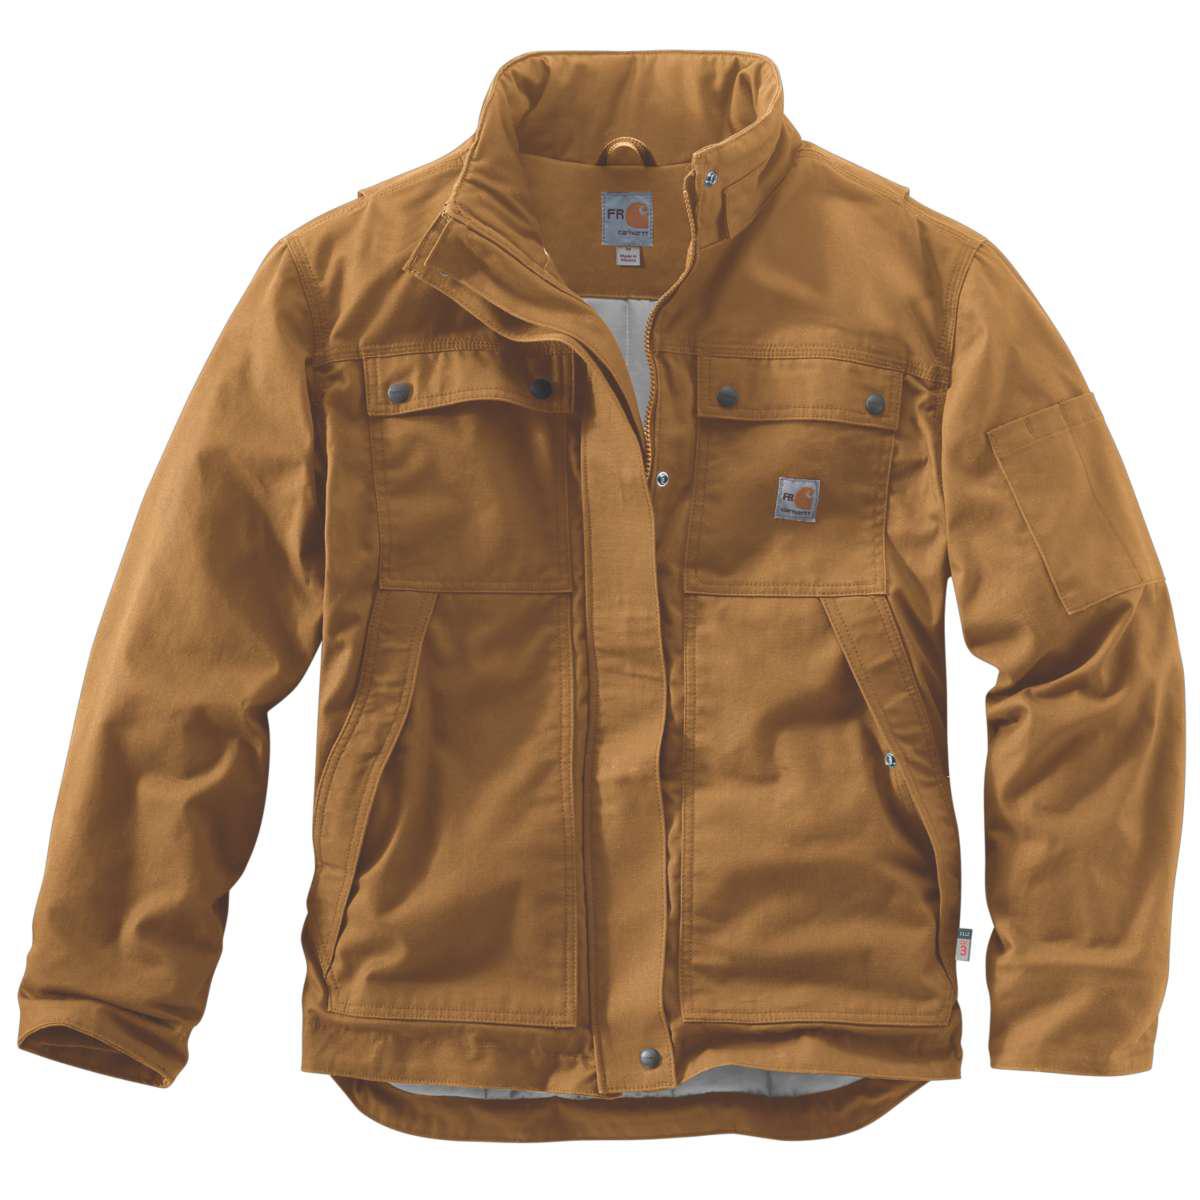 Carhartt Men's Full Swing Quick Duck Coat, Extended Sizes - Brown, L TALL